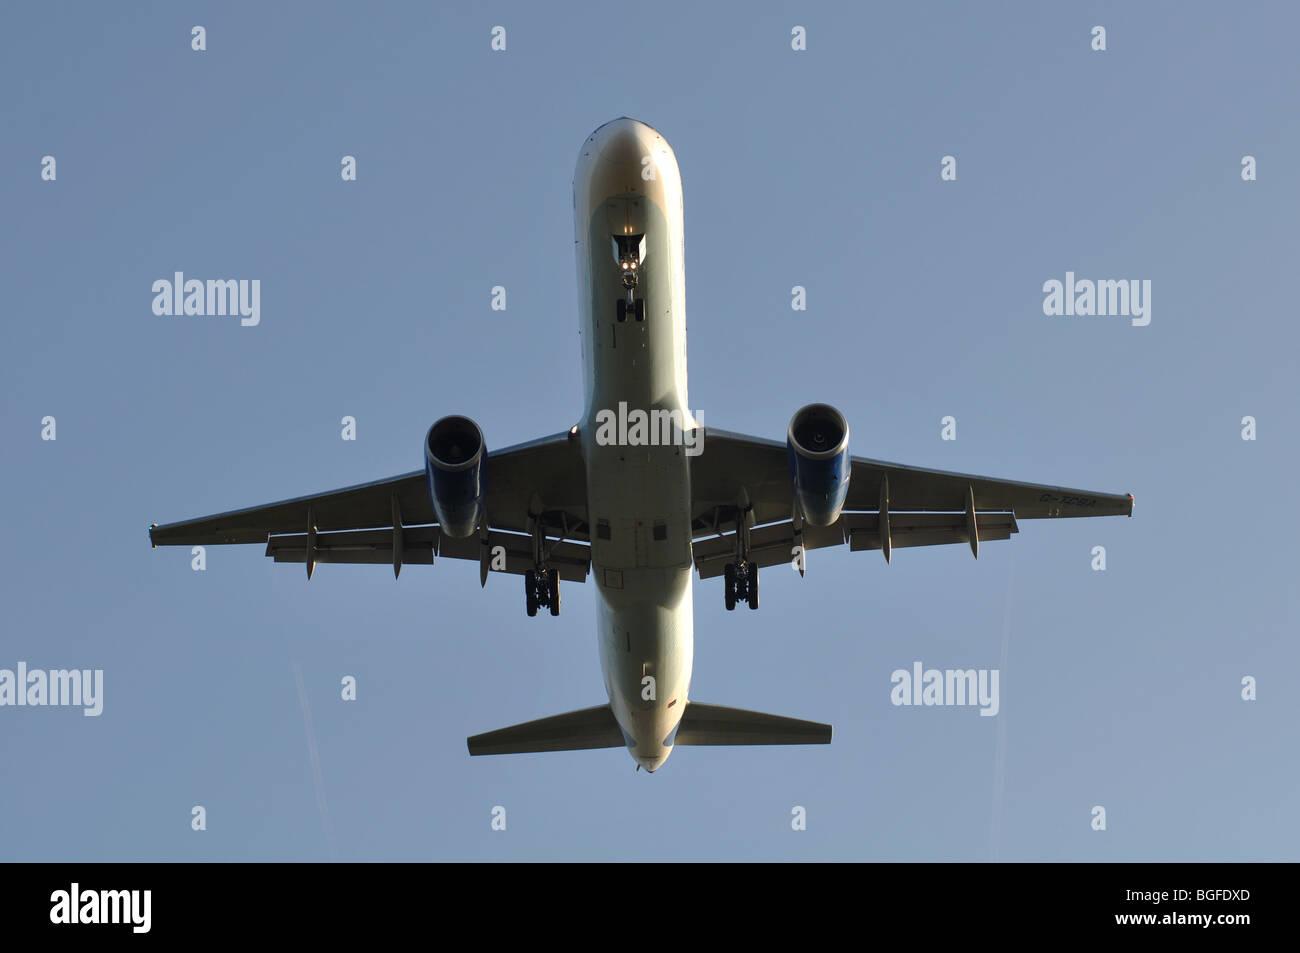 Thomas Cook Boeing 757 aircraft G-TCBA approaching Birmingham International Airport, UK - Stock Image